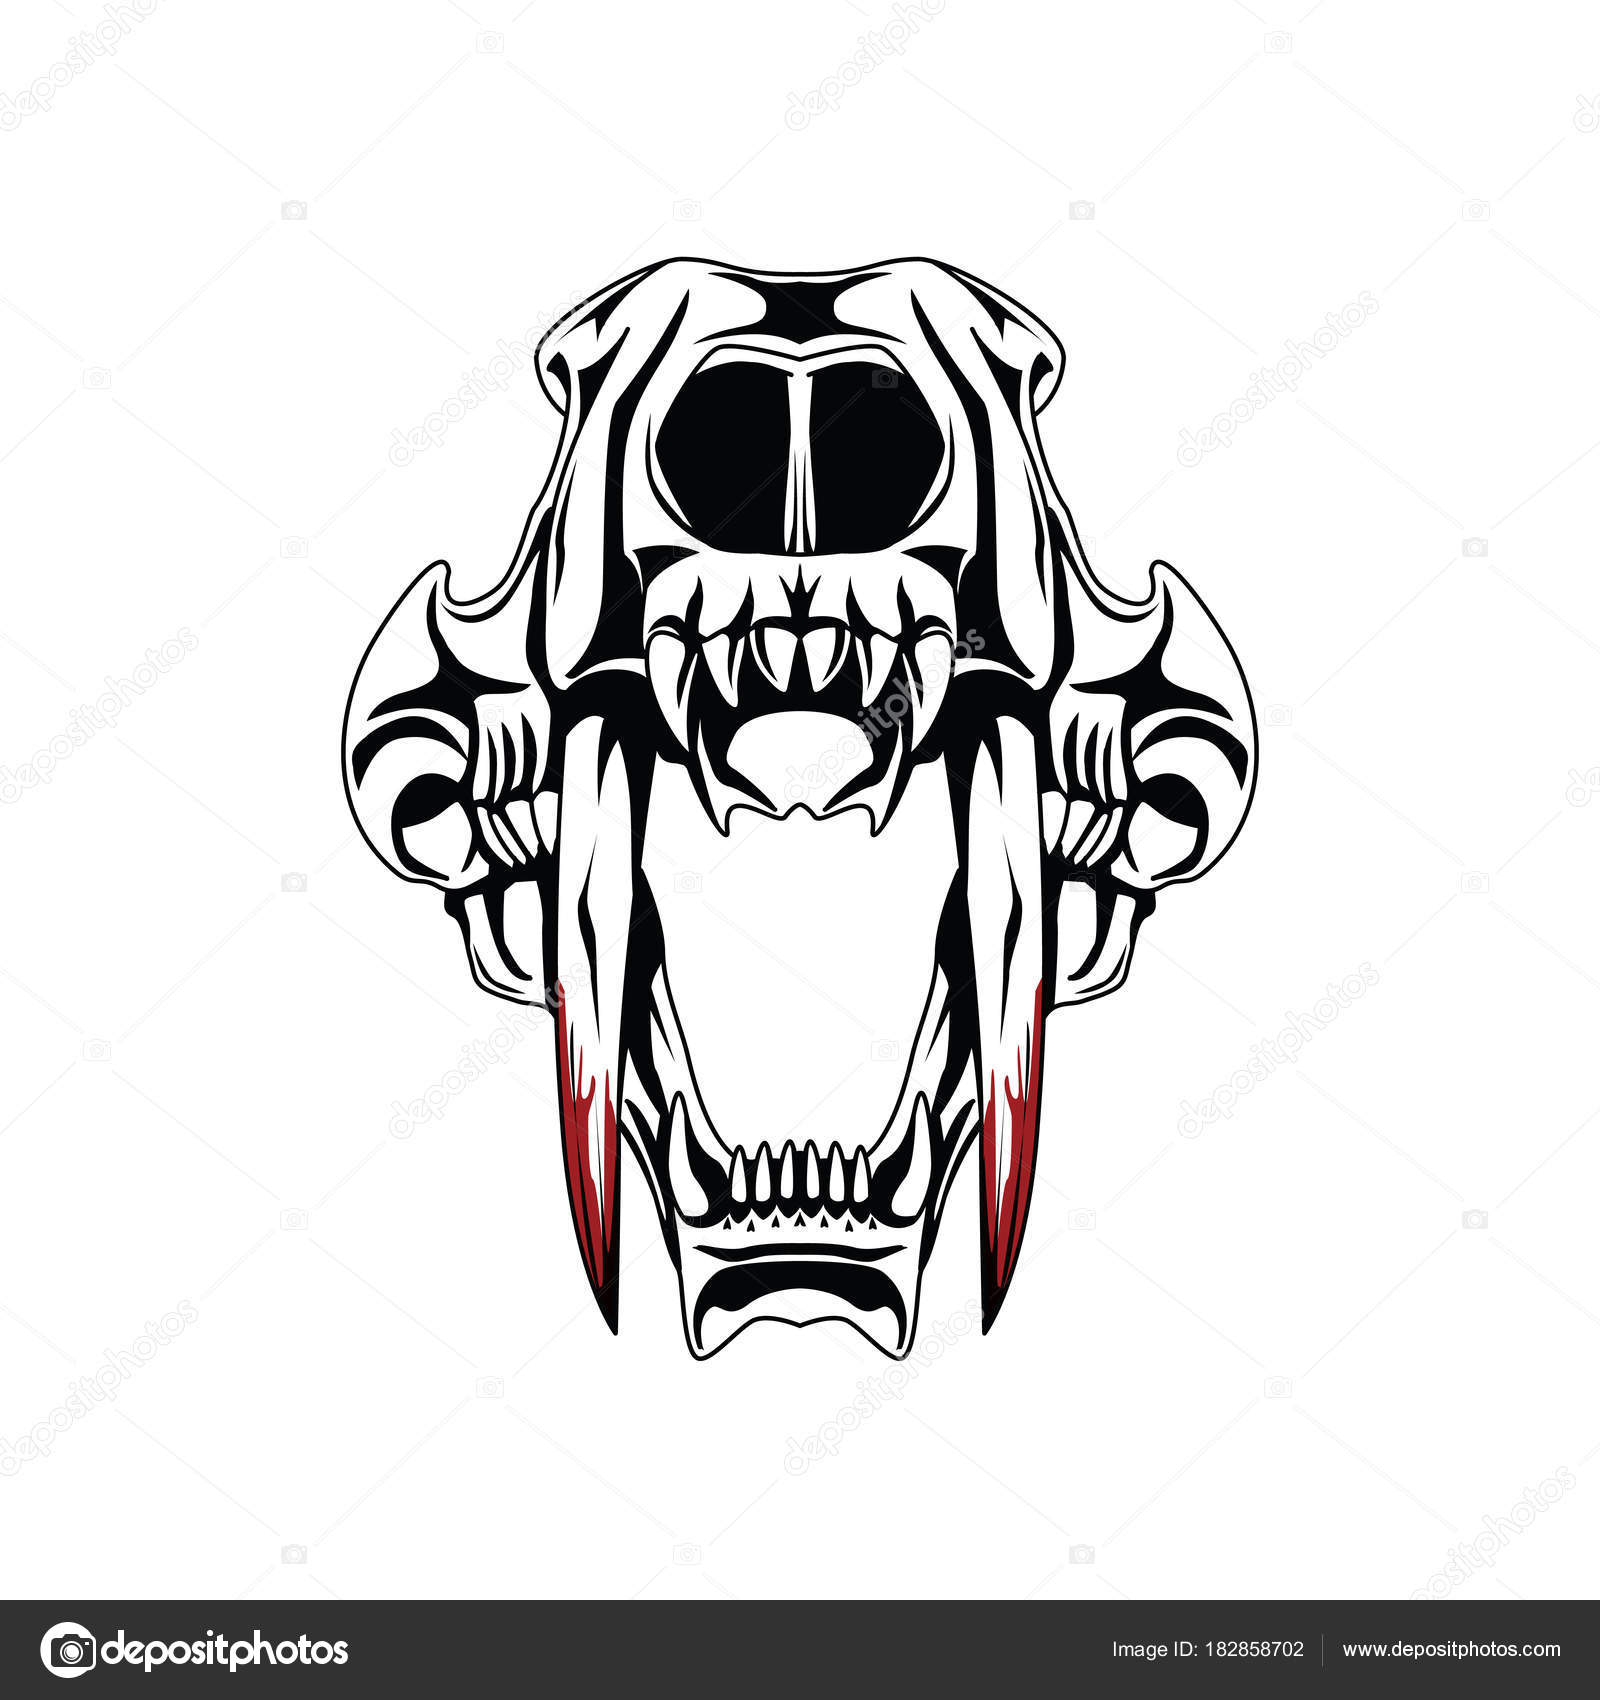 Saber Tooth Tiger Skull Tattoo Stock Photo Doddy77 182858702